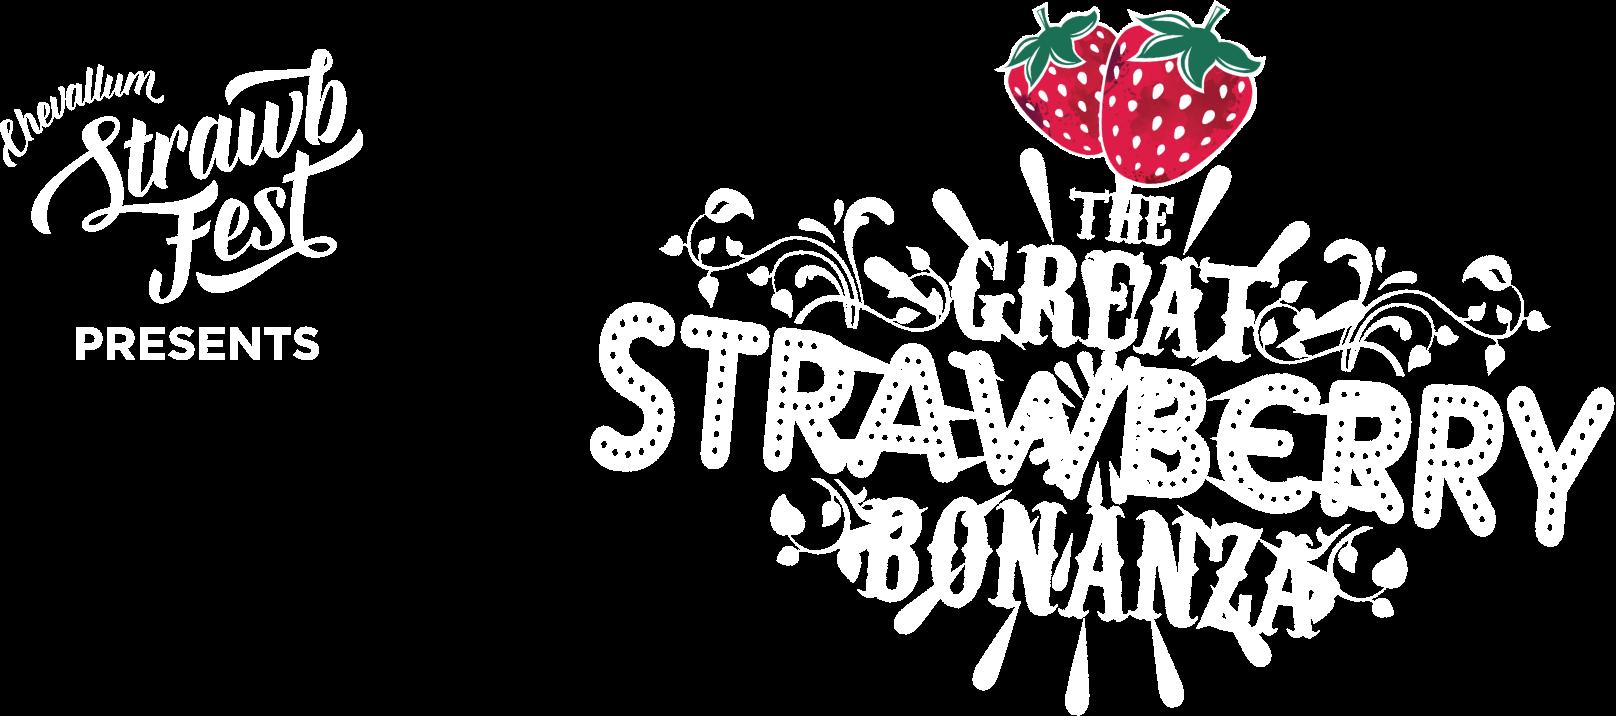 Chevallum Strawbfest